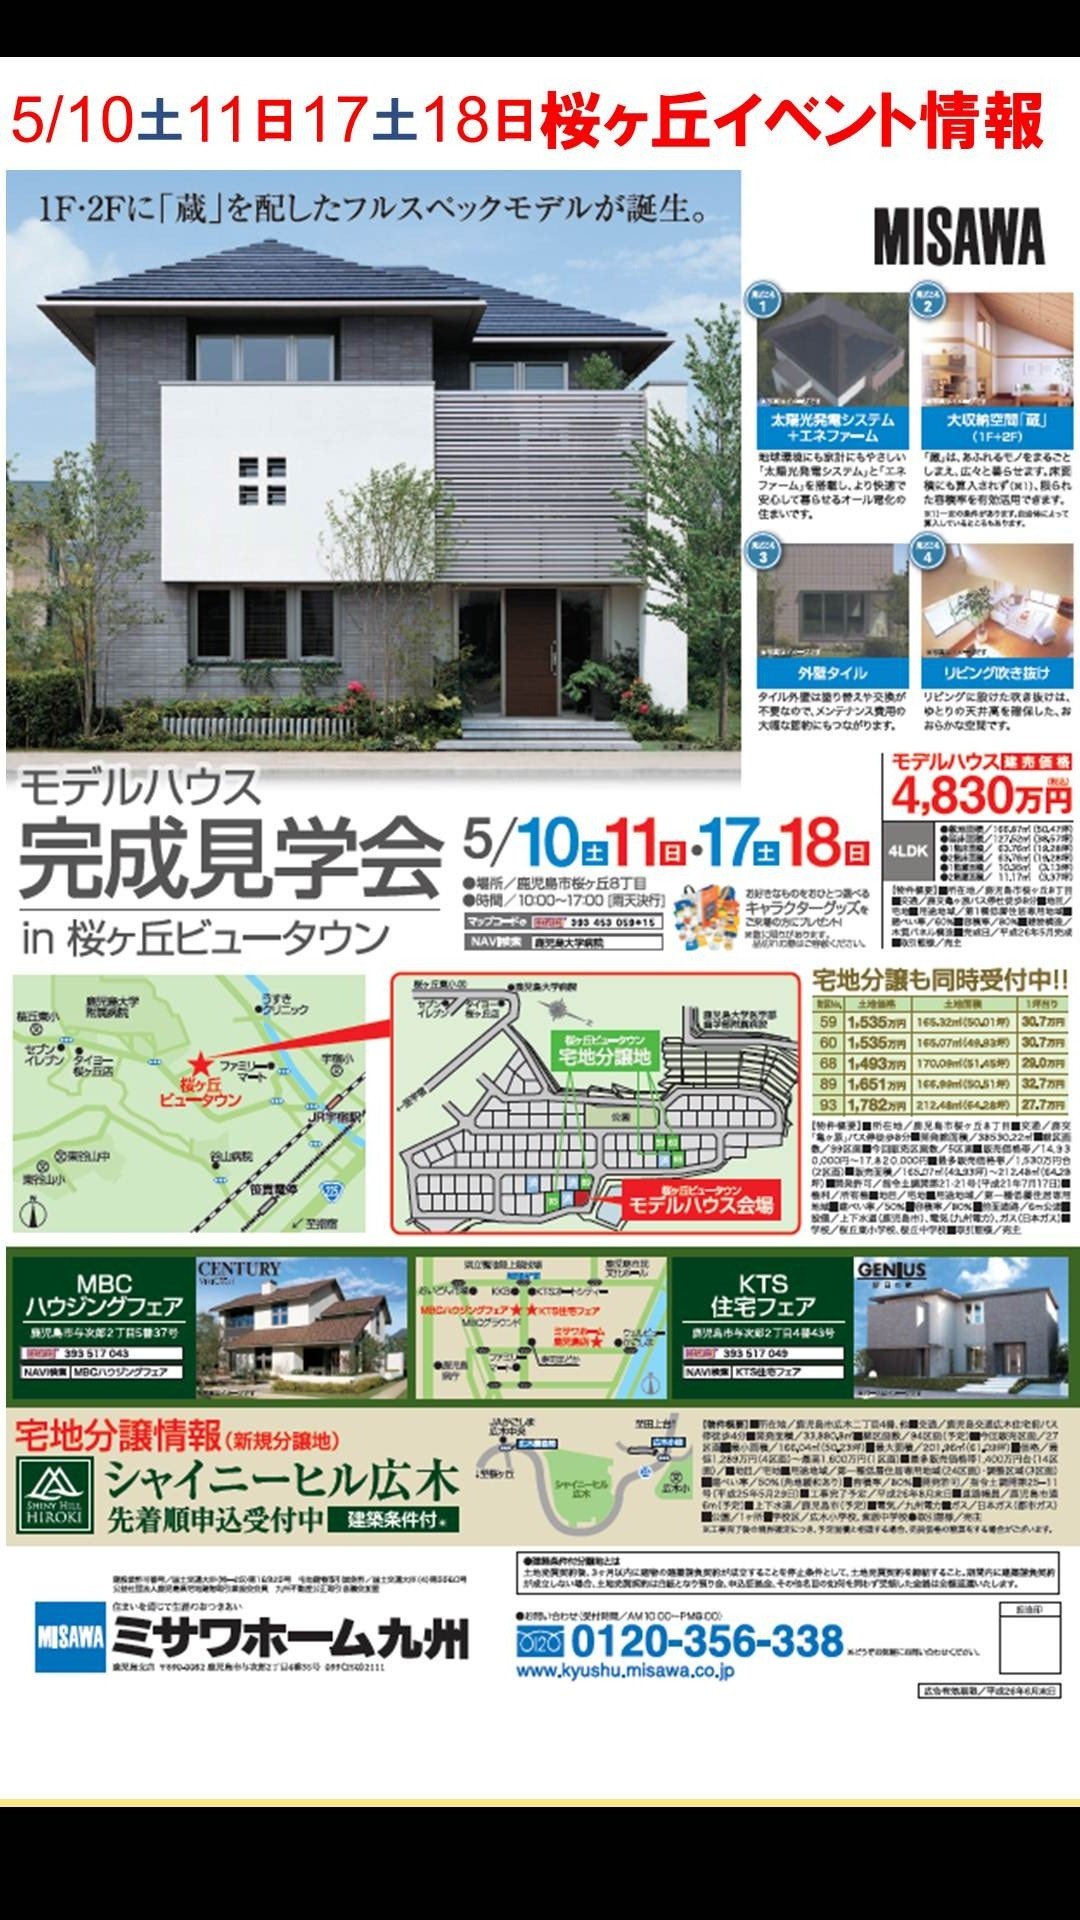 2sakuragaokasumaifea.JPG